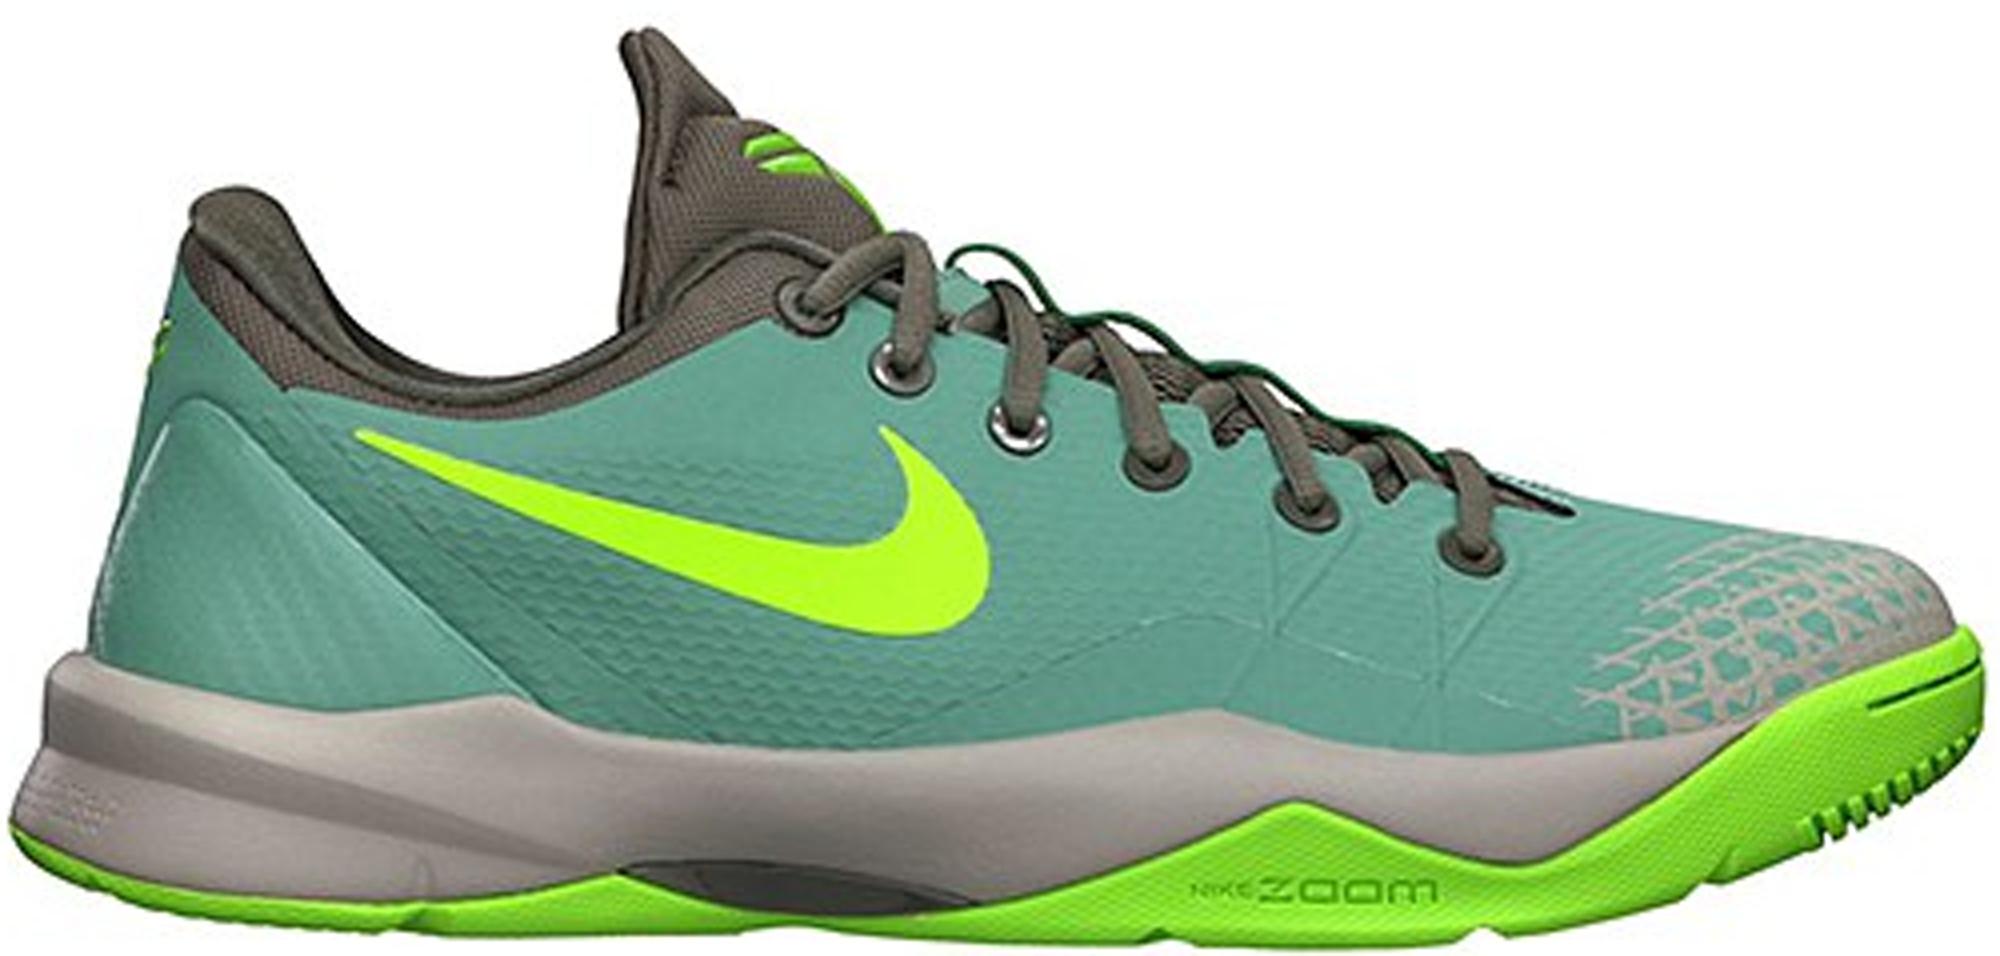 Nike Zoom Kobe Venomenon 4 Diffused